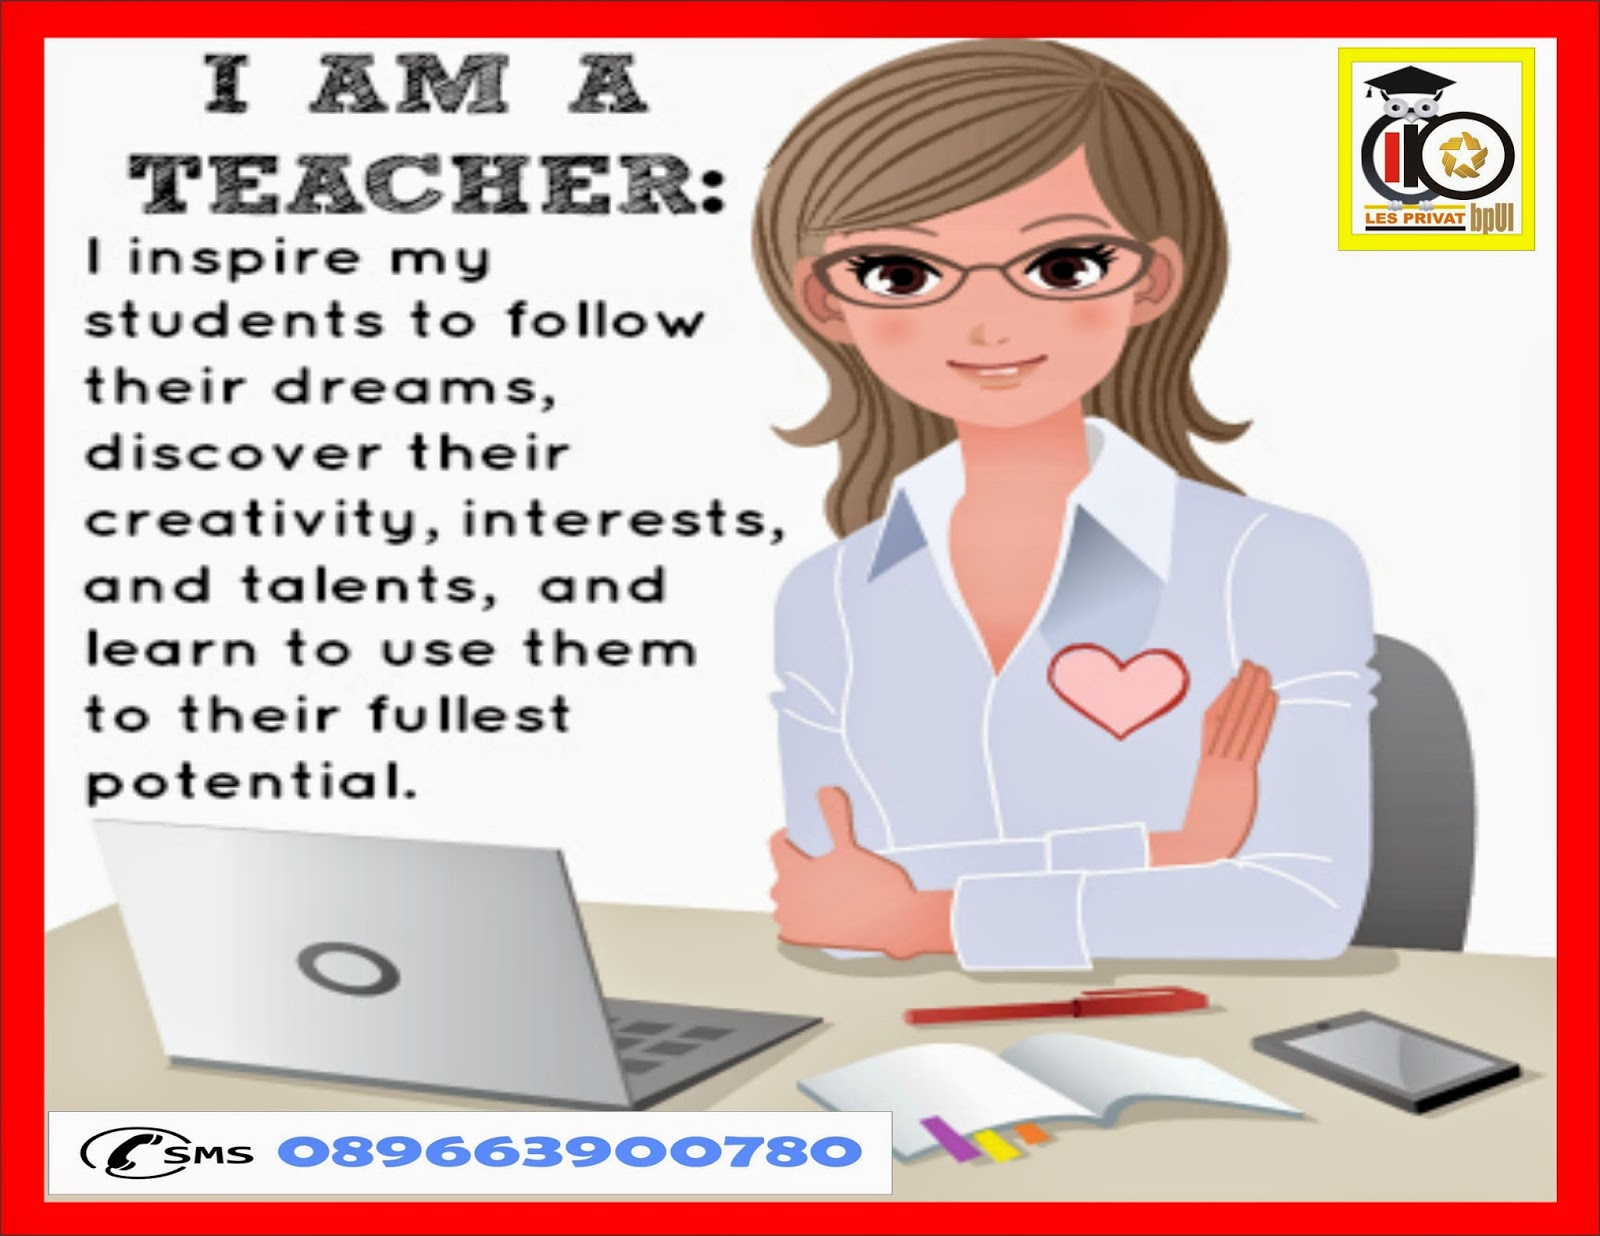 guru privat profesional ,ramah ,berpengalaman untuk sd ,smp ,sma